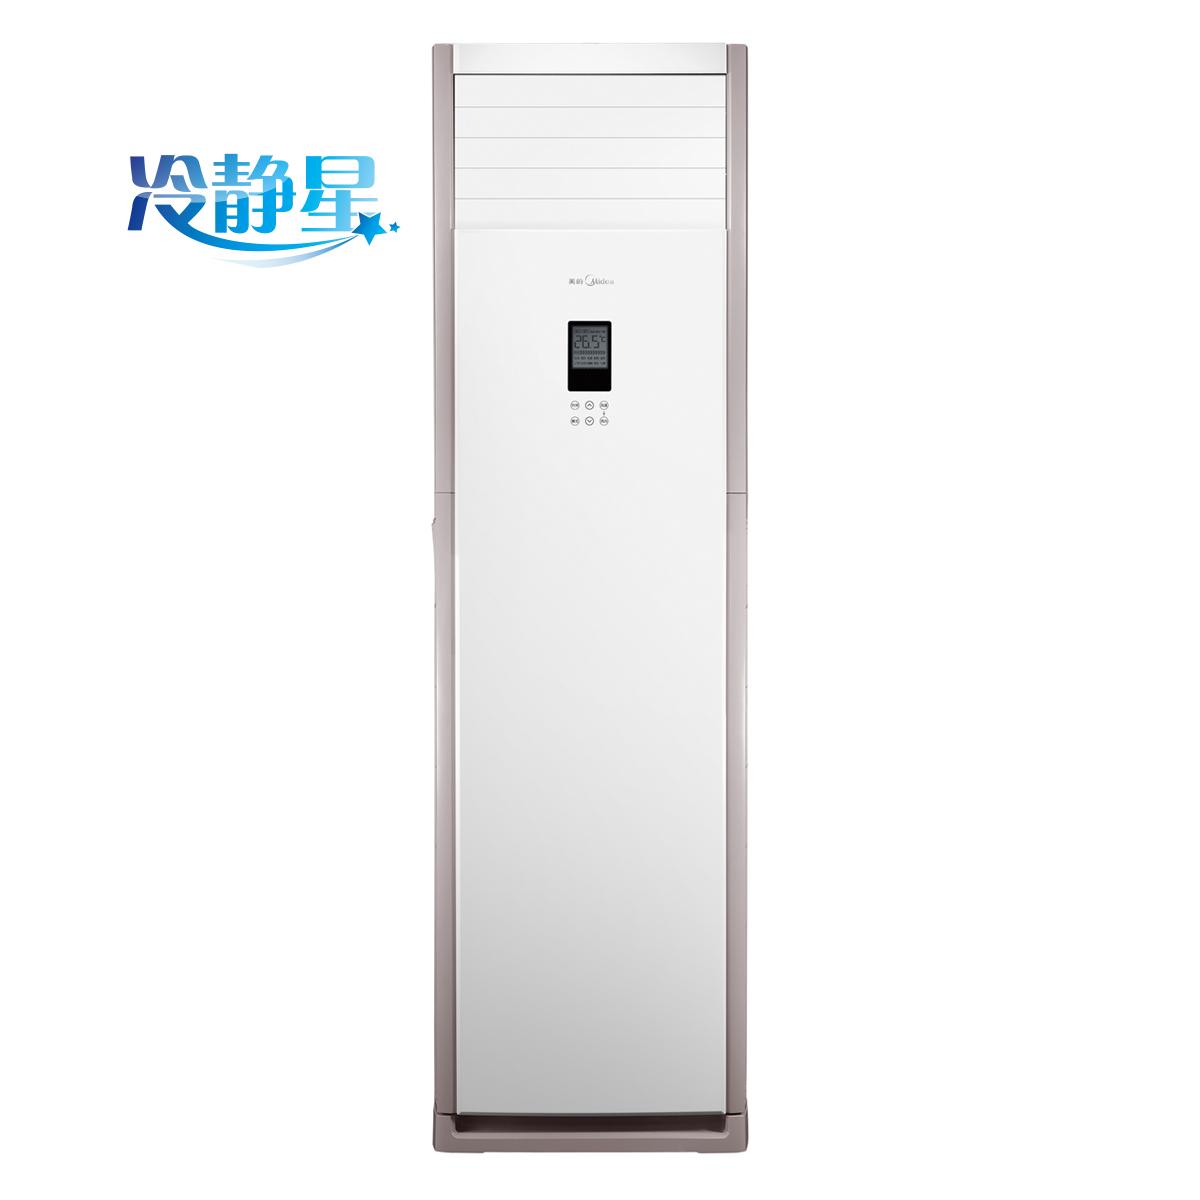 Midea/美的 KFR-72LW/SDY-PA400(D3) 家用空调套机 说明书.pdf